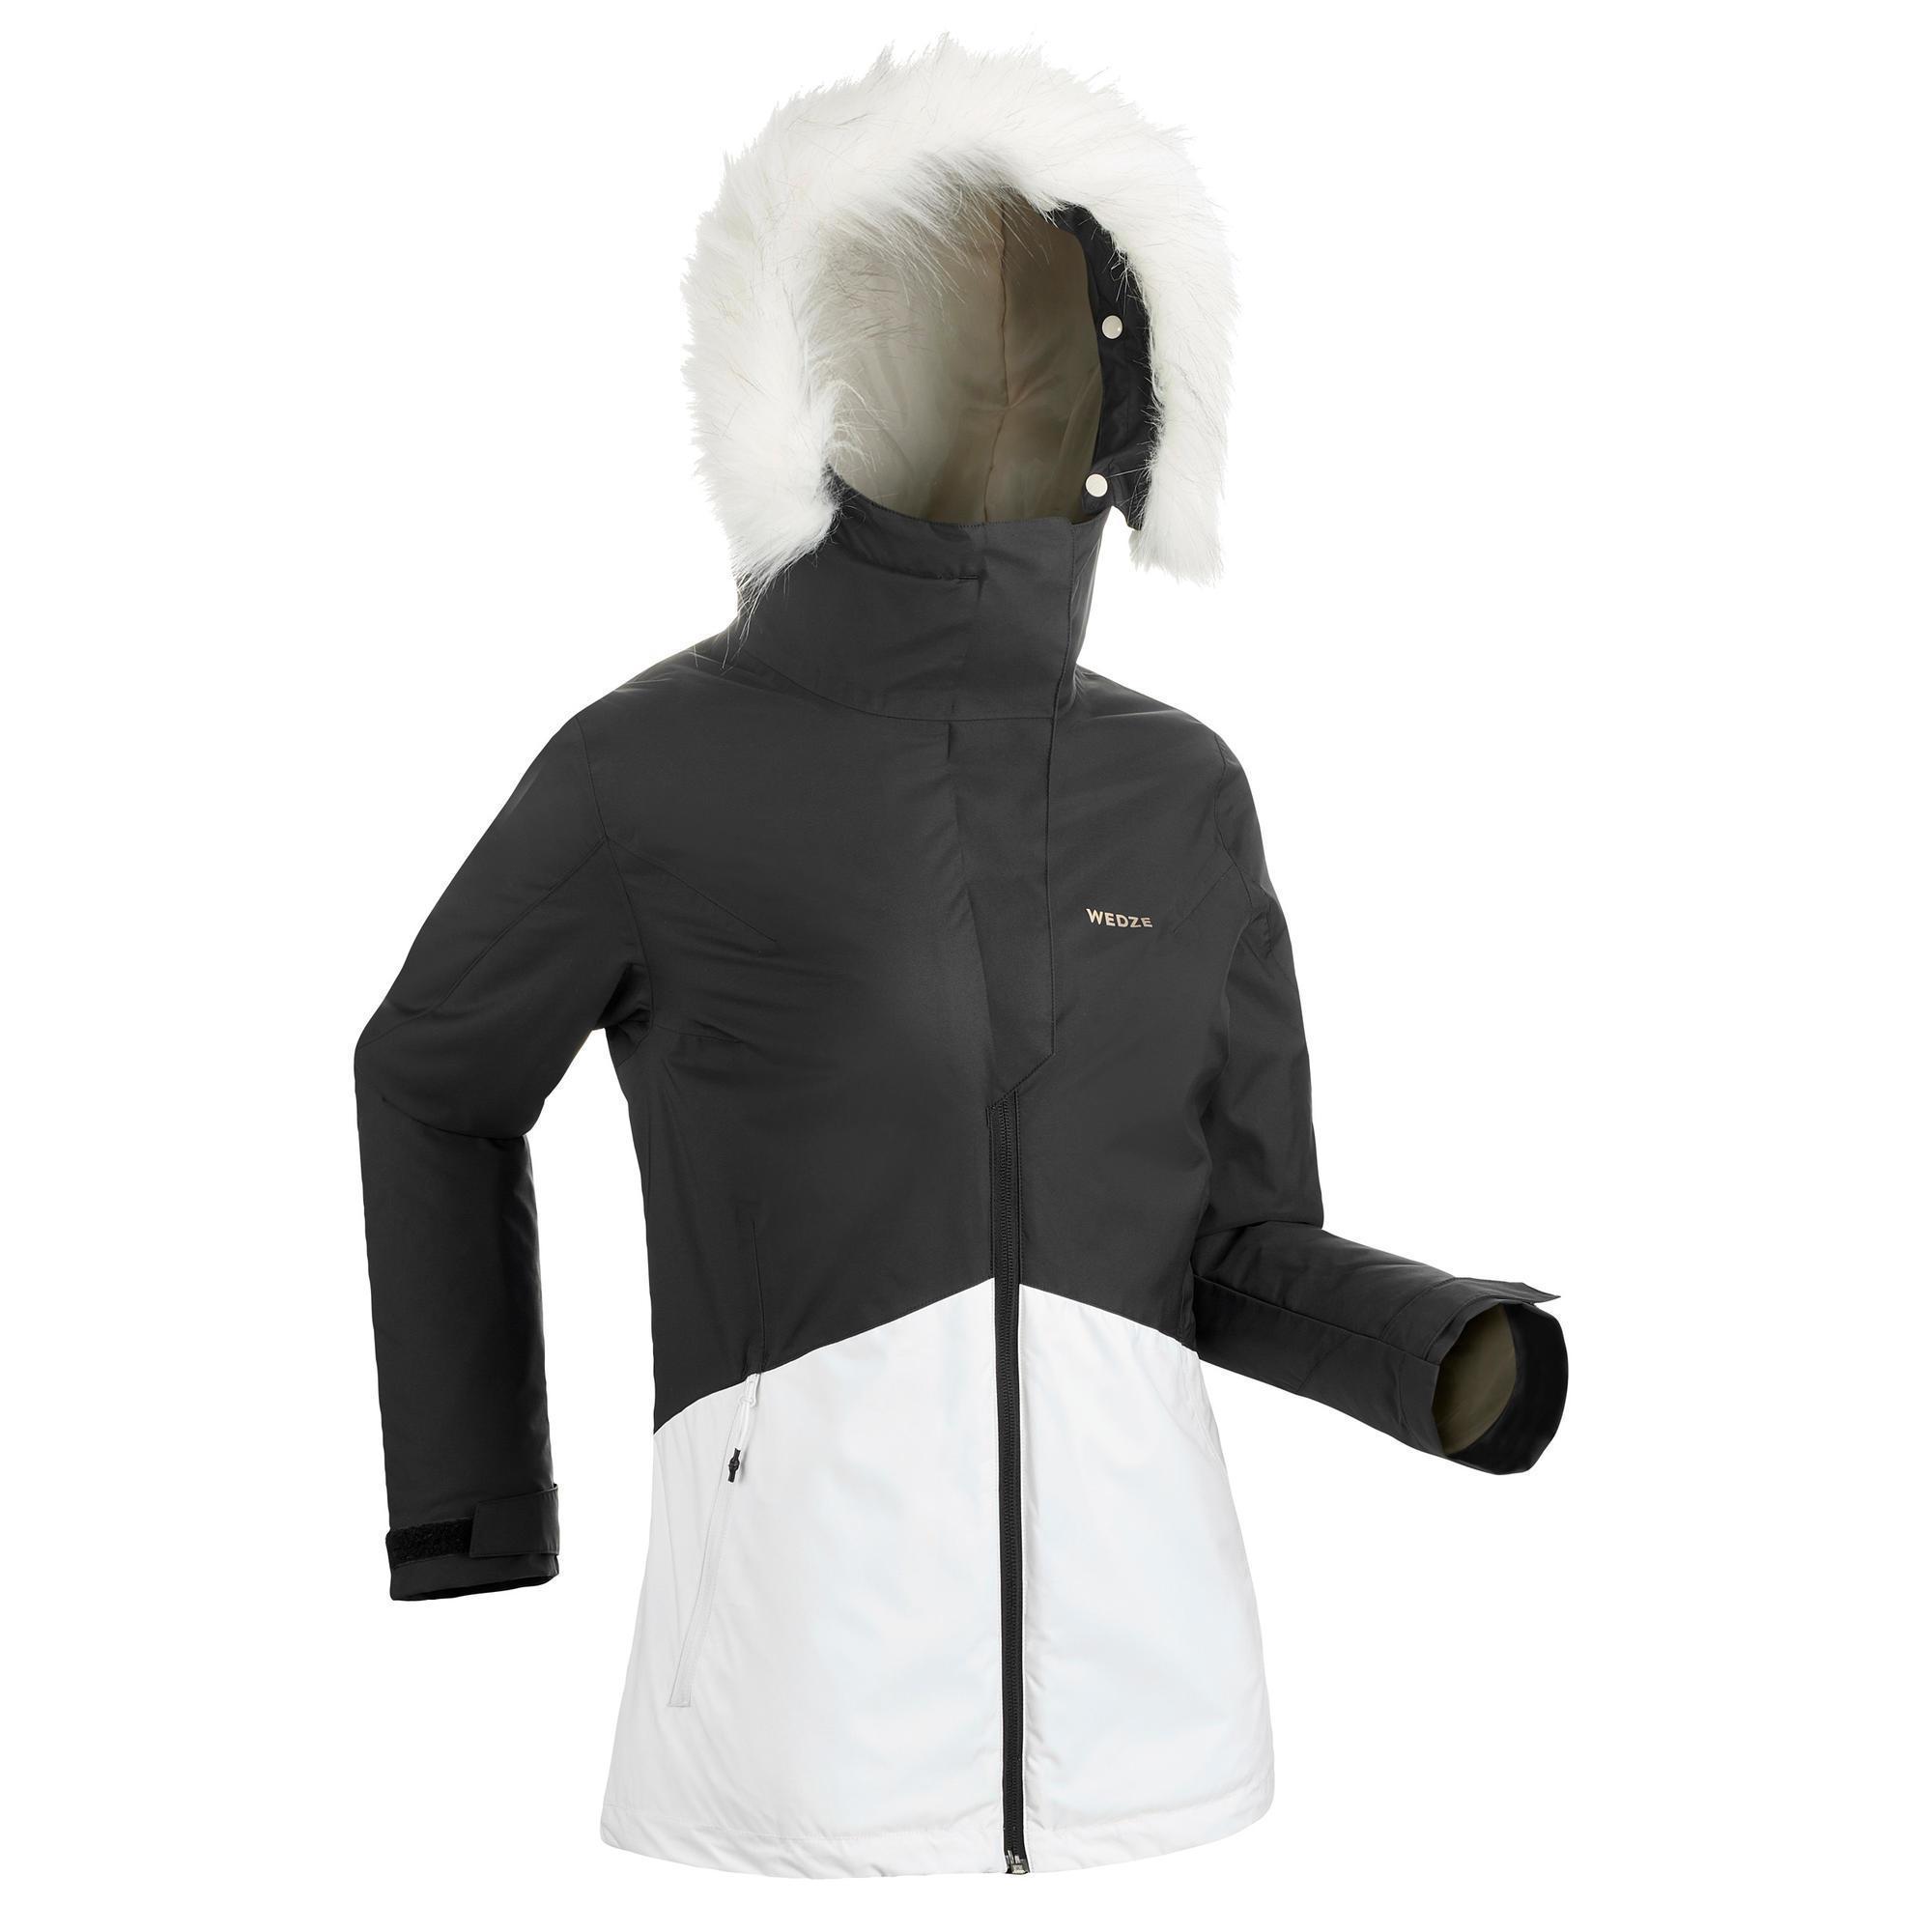 Veste ski cintree femme